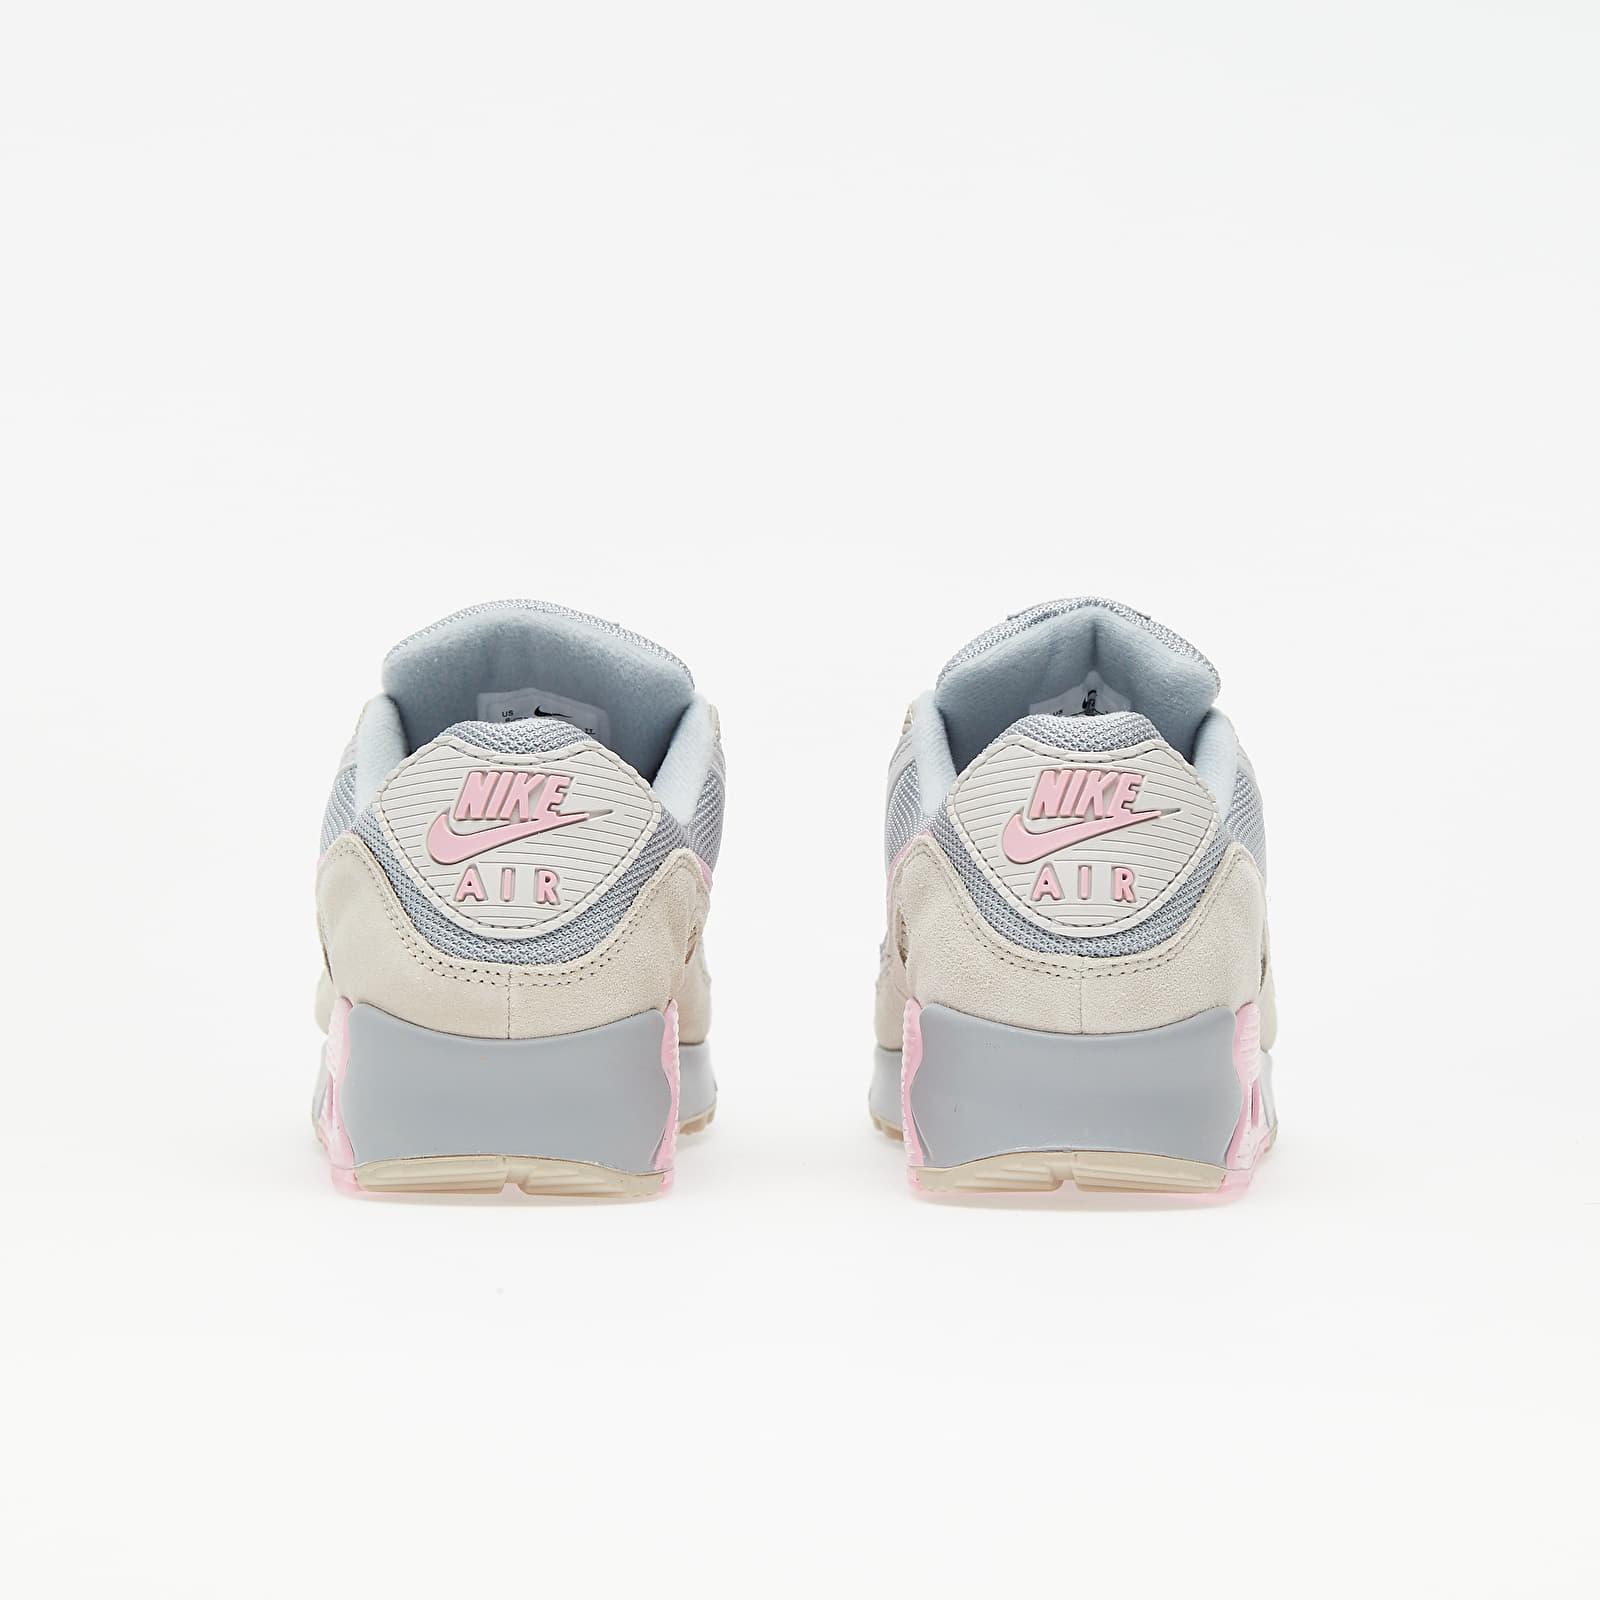 Nike Air Max 90 Vast Grey/ Pink-Wolf Grey-String, Gray